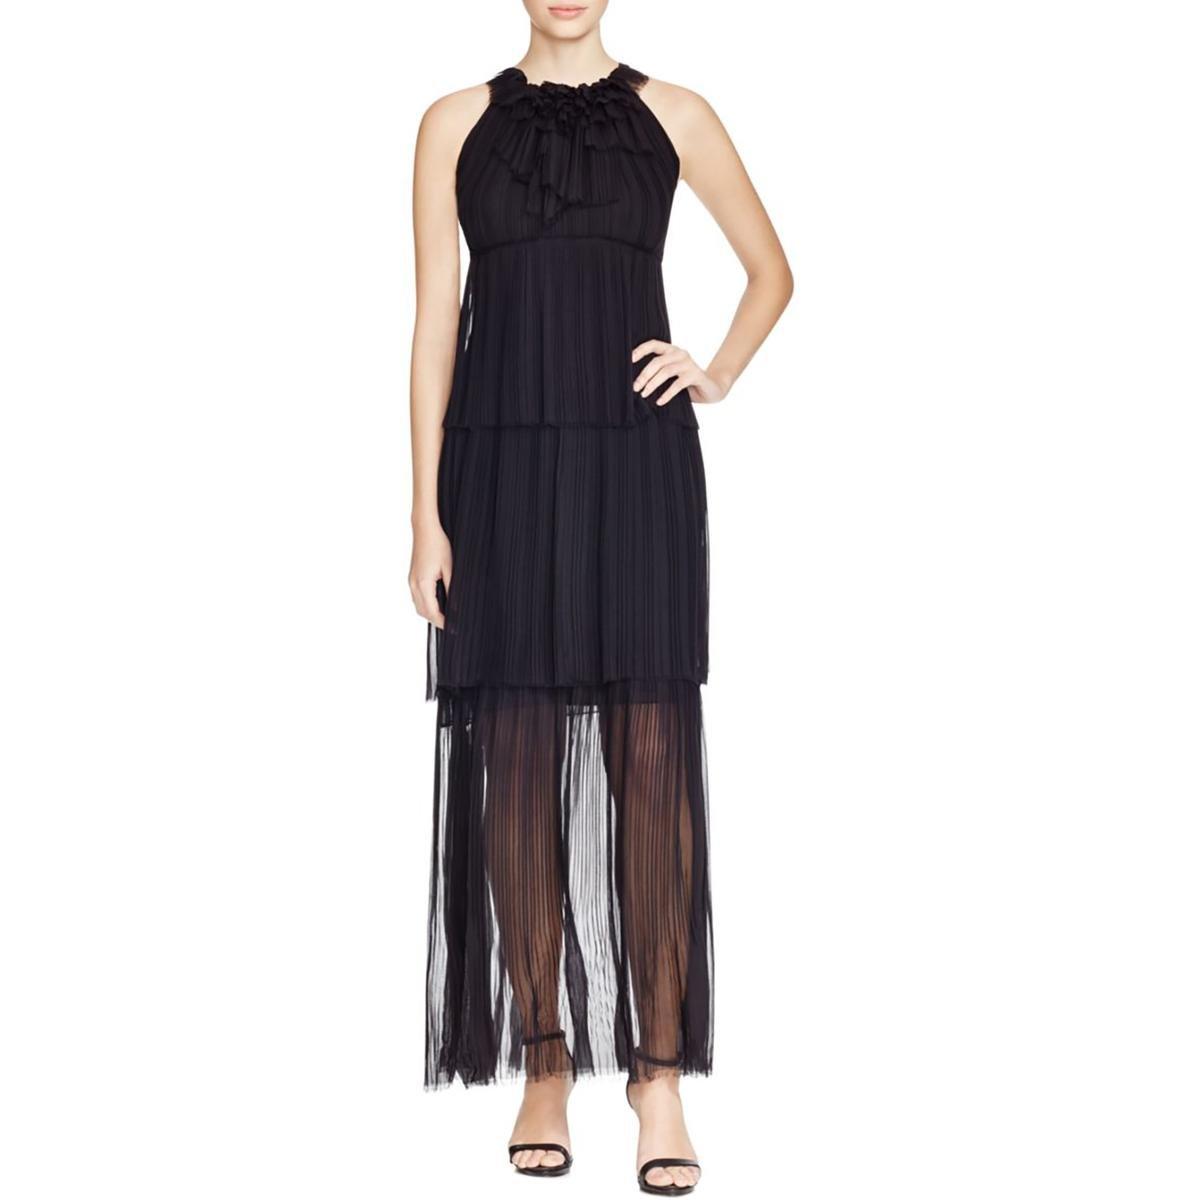 6f0b8a390a96b Elie Tahari Women's Chiffon Sheer Formal Dress Black XS at Amazon Women's  Clothing store: